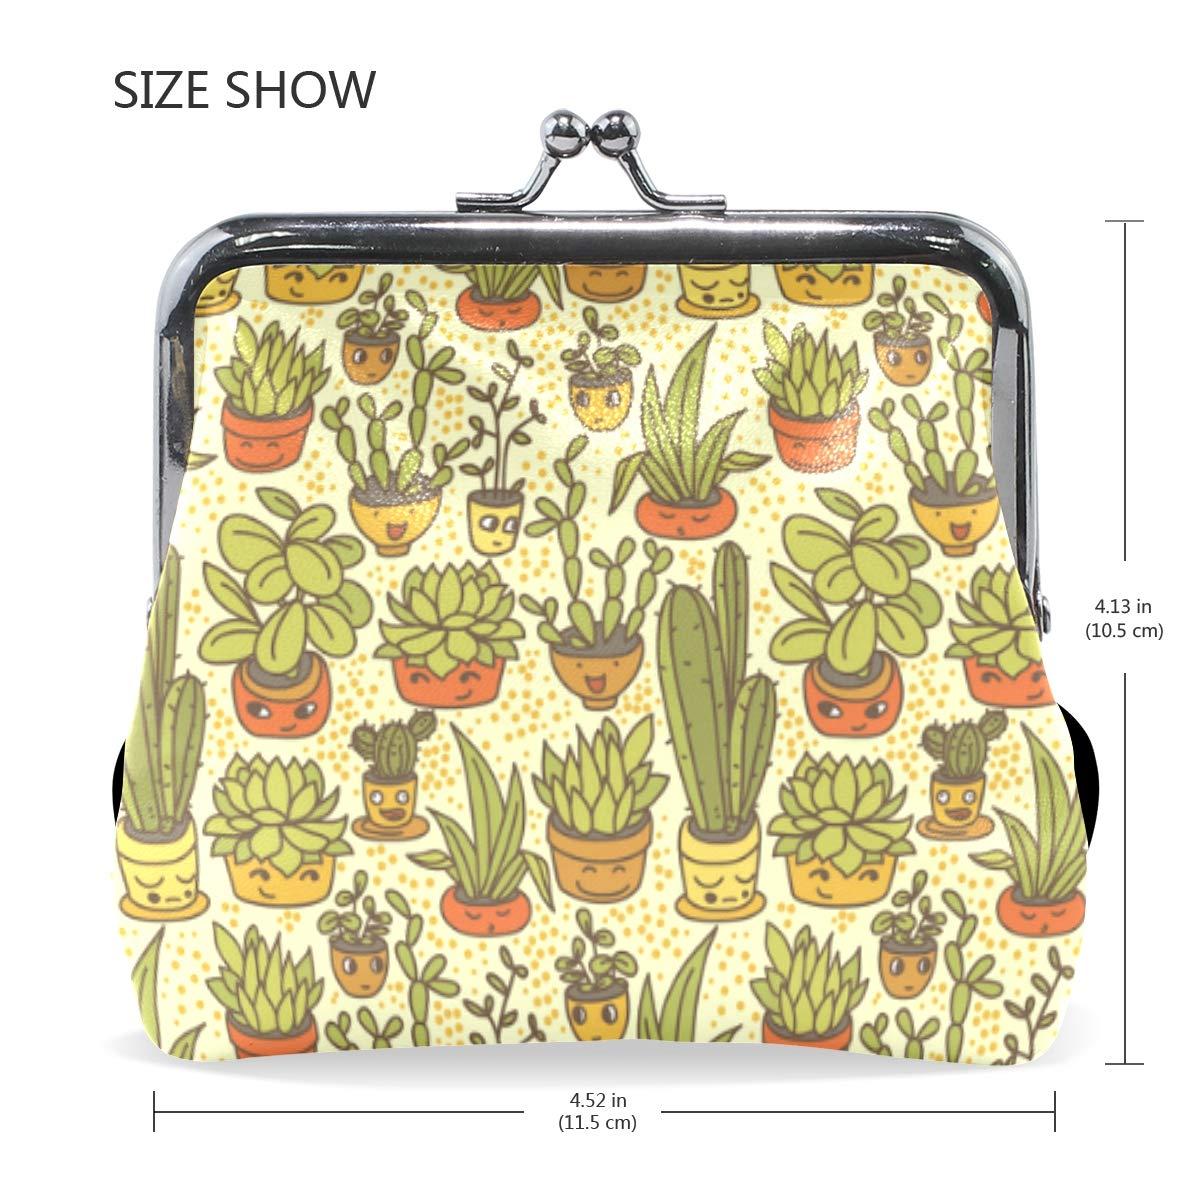 Fashion Womens Coin Purse Potted Plants Cactus Cartoon Faces Vintage Pouch Kiss-lock Mini Purse Wallets